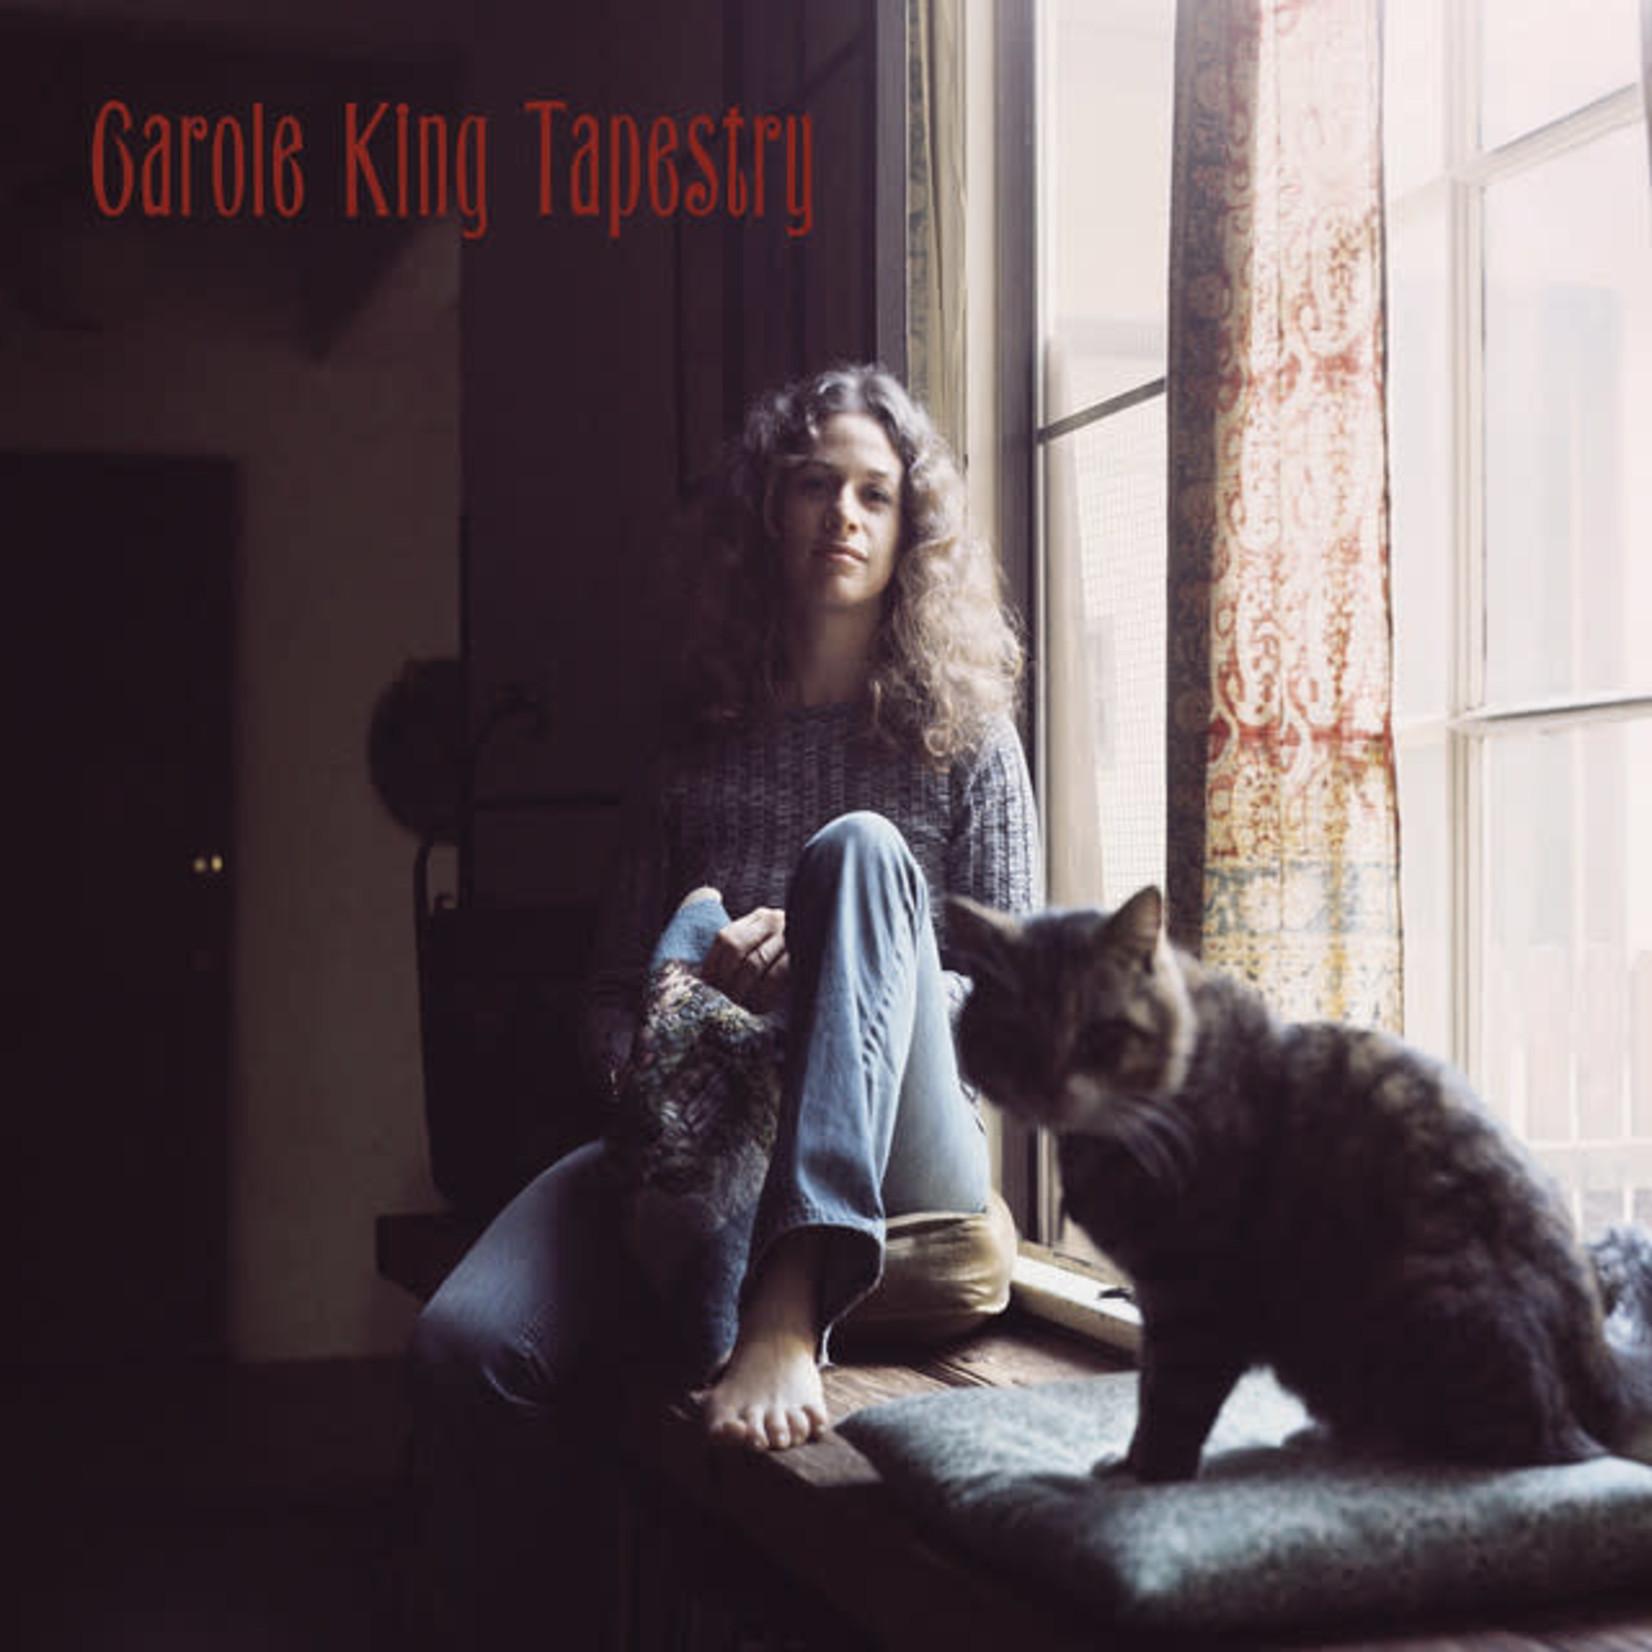 Vinyl Carole King - Tapestry